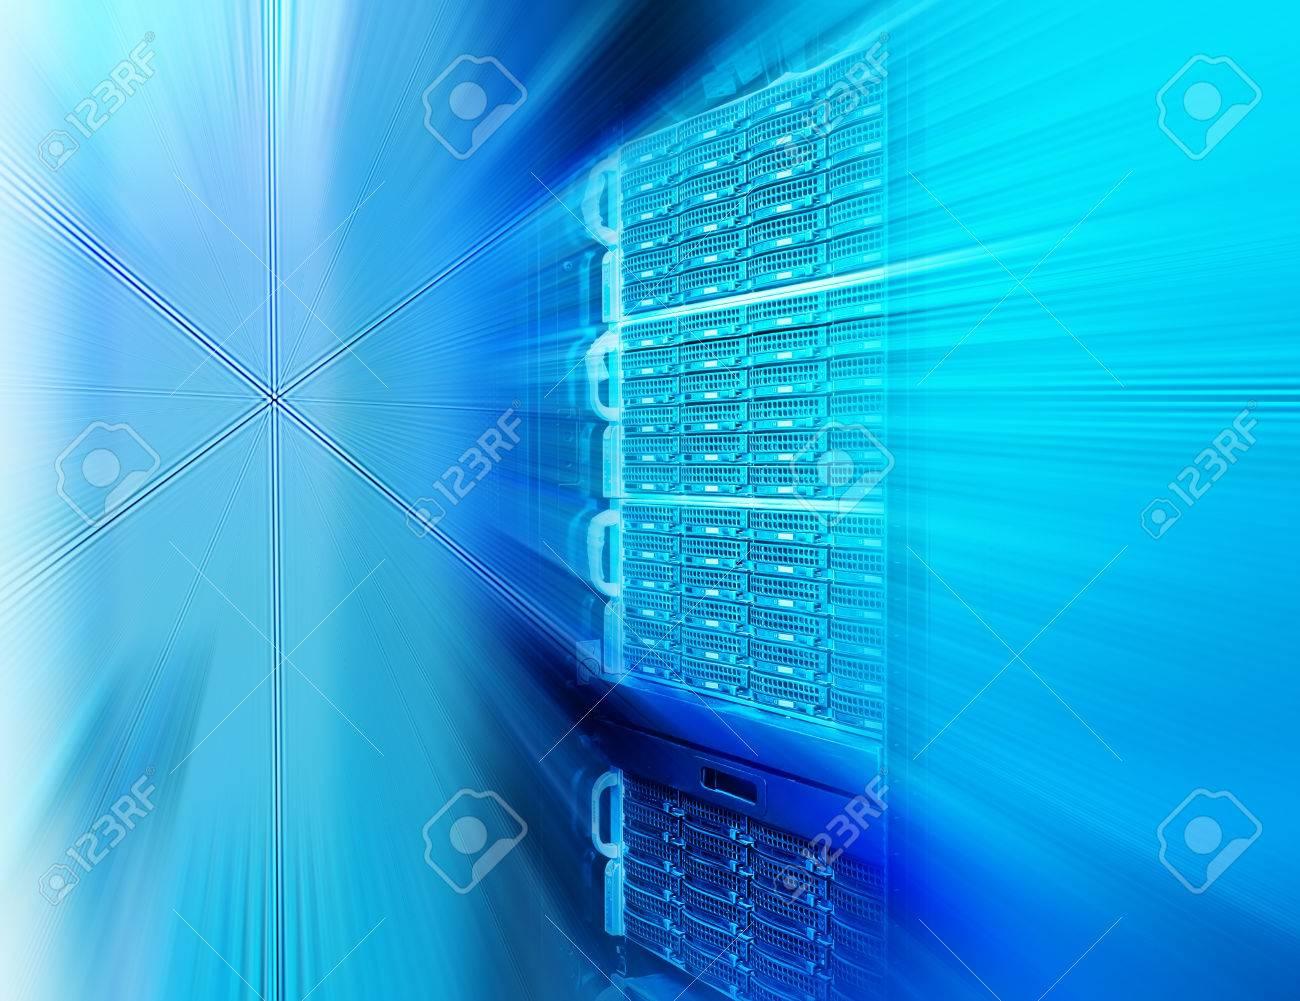 rows of server hardware in data center - 55424206